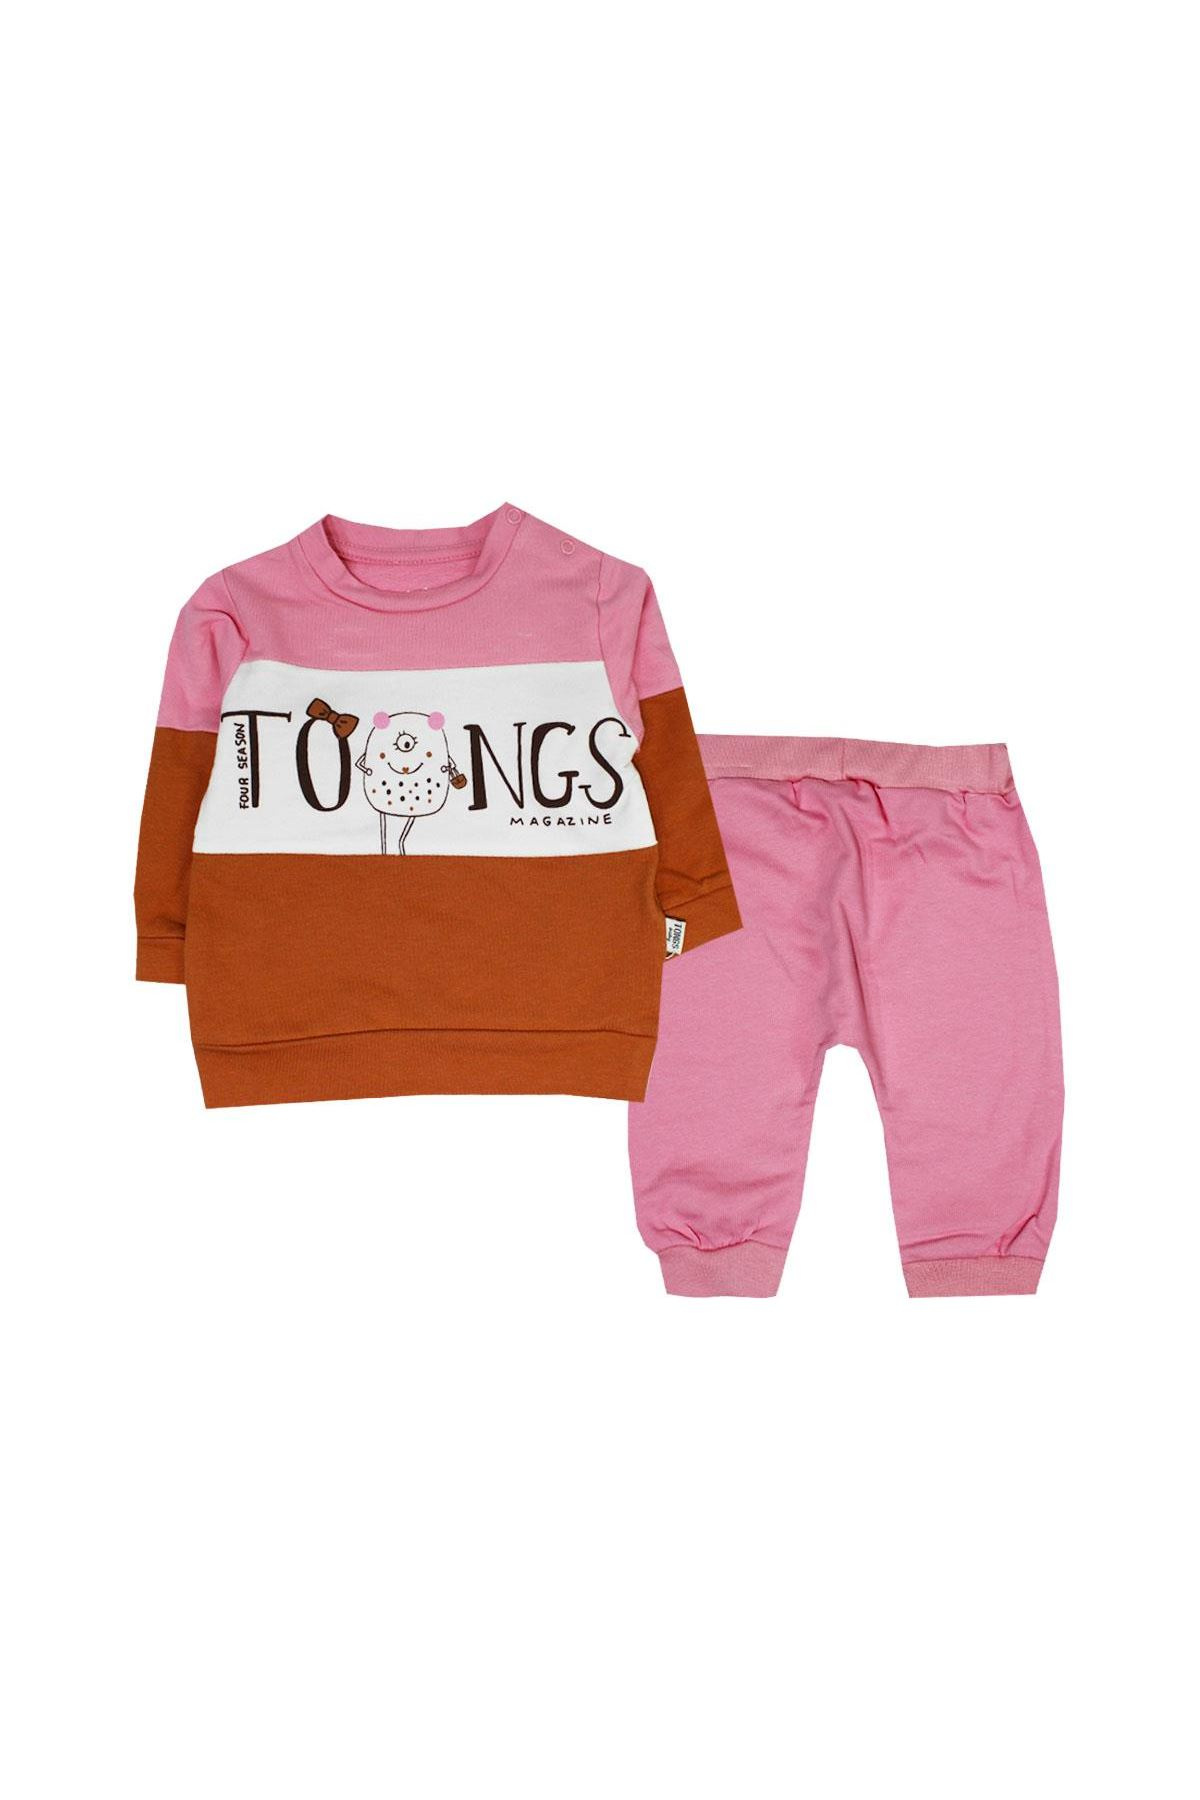 Tongs Baby 2li Bebe Takım 2638 Pembe